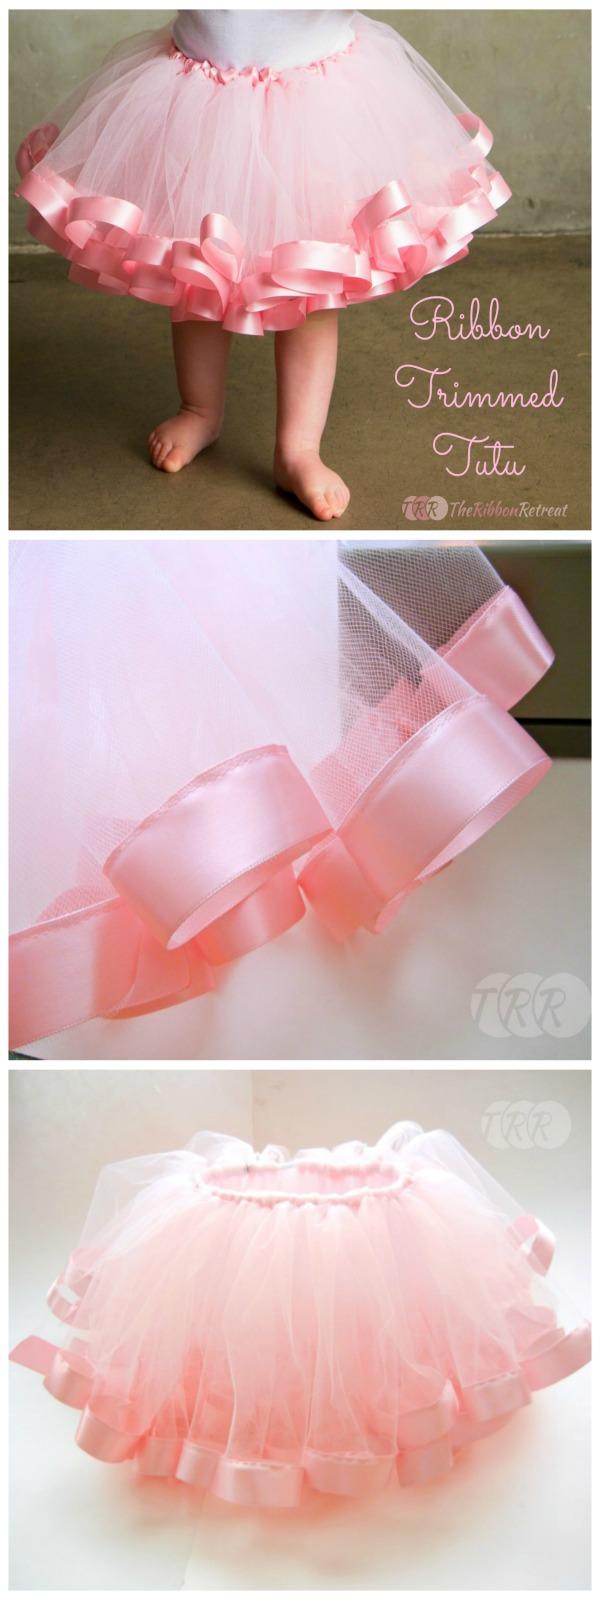 Ribbon trimmed tutu tutorial